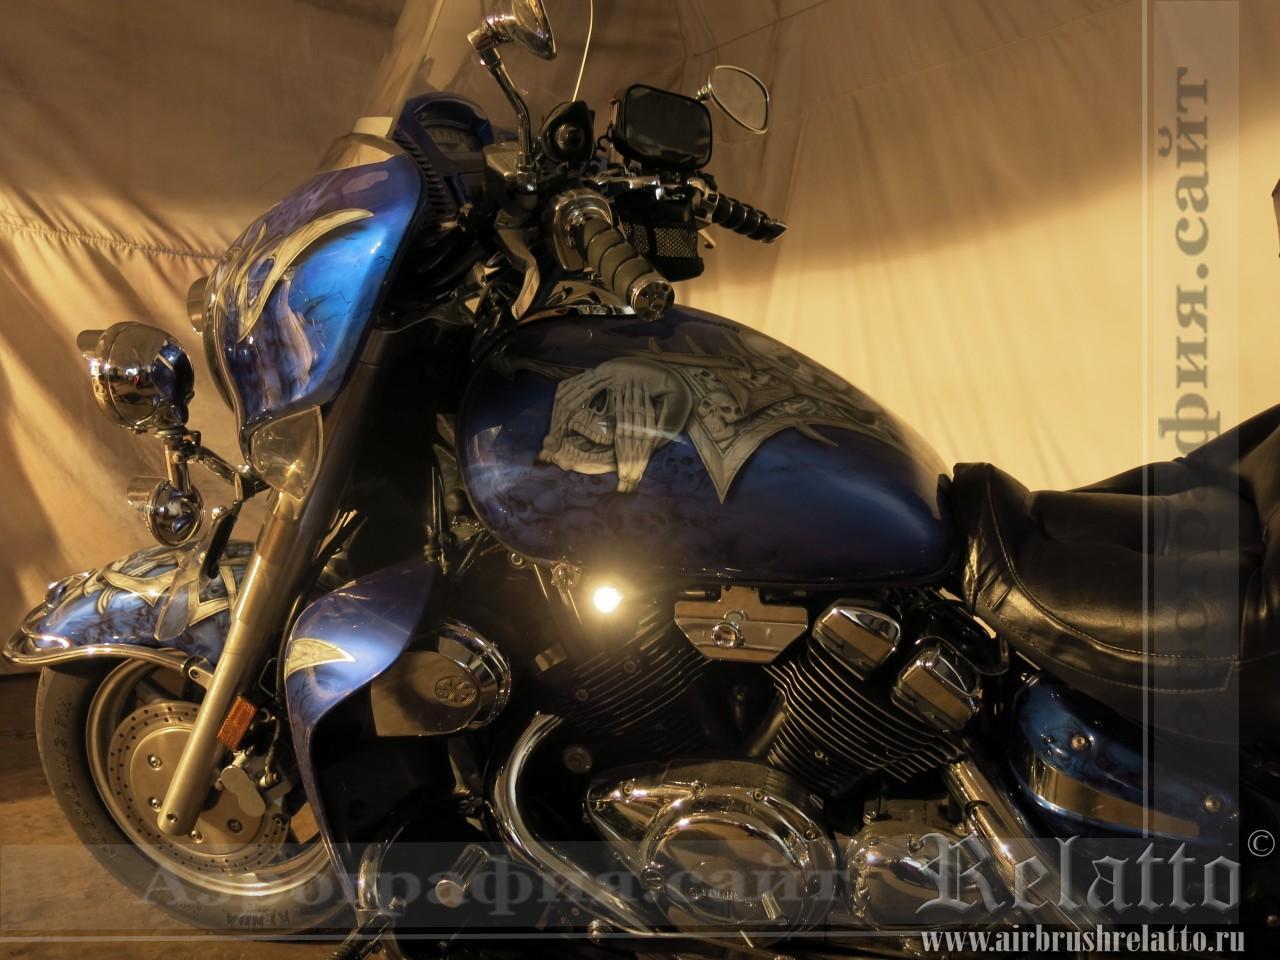 Черепа на мотоцикле Yamaha Venture